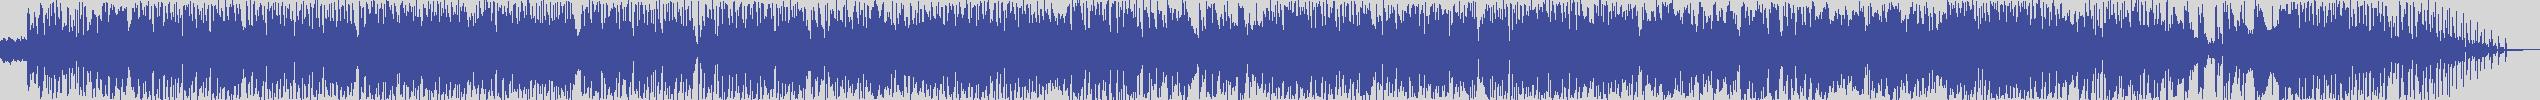 smilax_dig_records [SDR001] Los Malos, Gabriel - Sms Salvaje [Original Mix] audio wave form